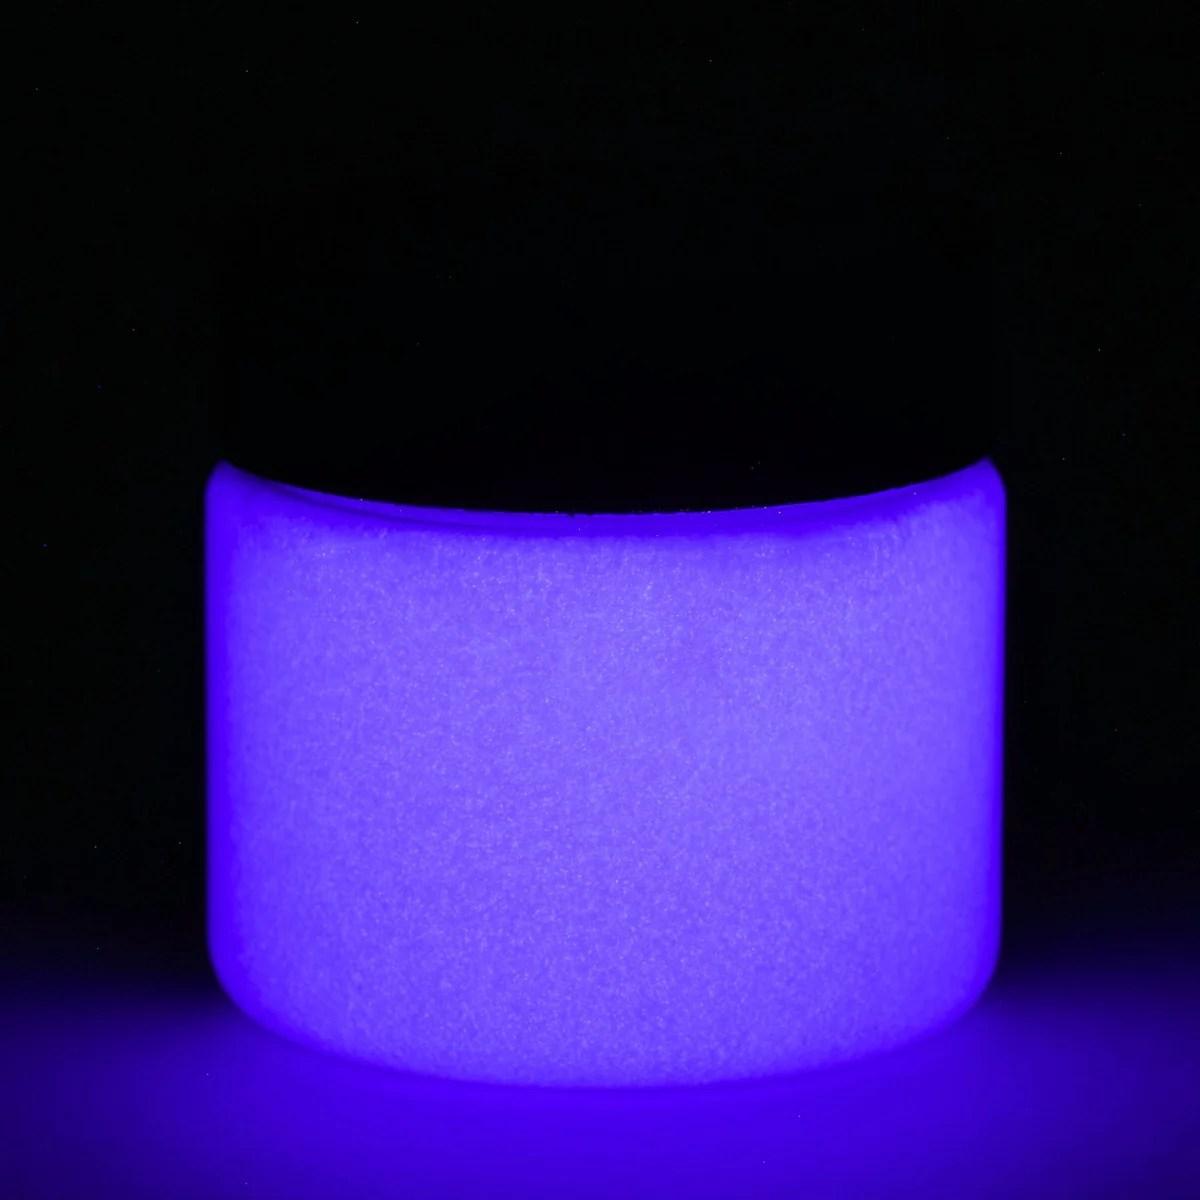 Fluorescent Purple Glow Paint - In Dark And Uv